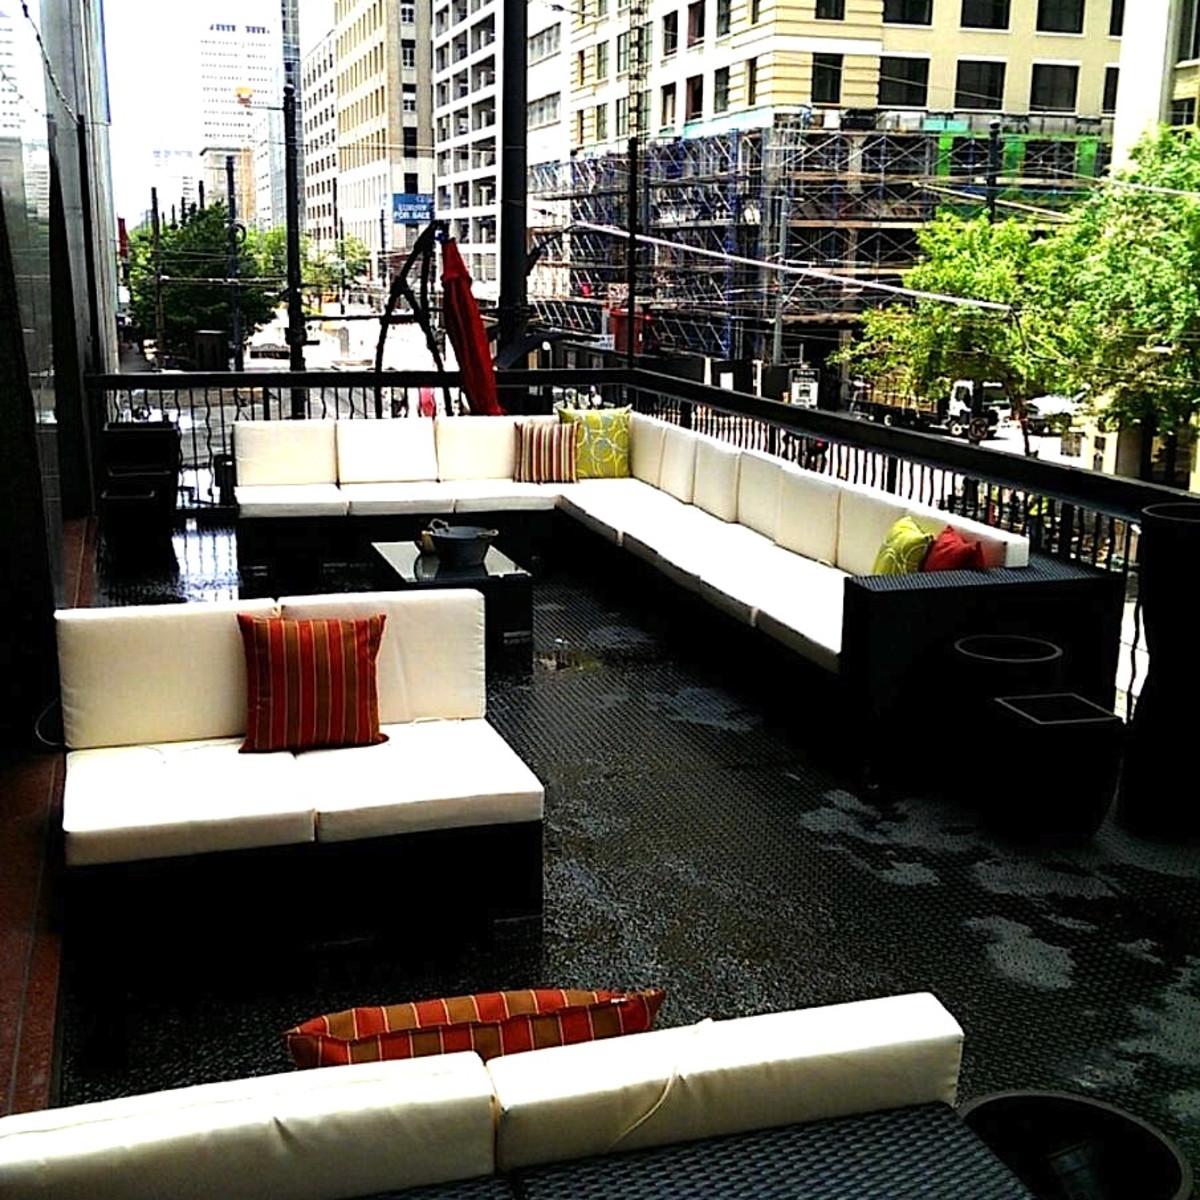 Springbok patio